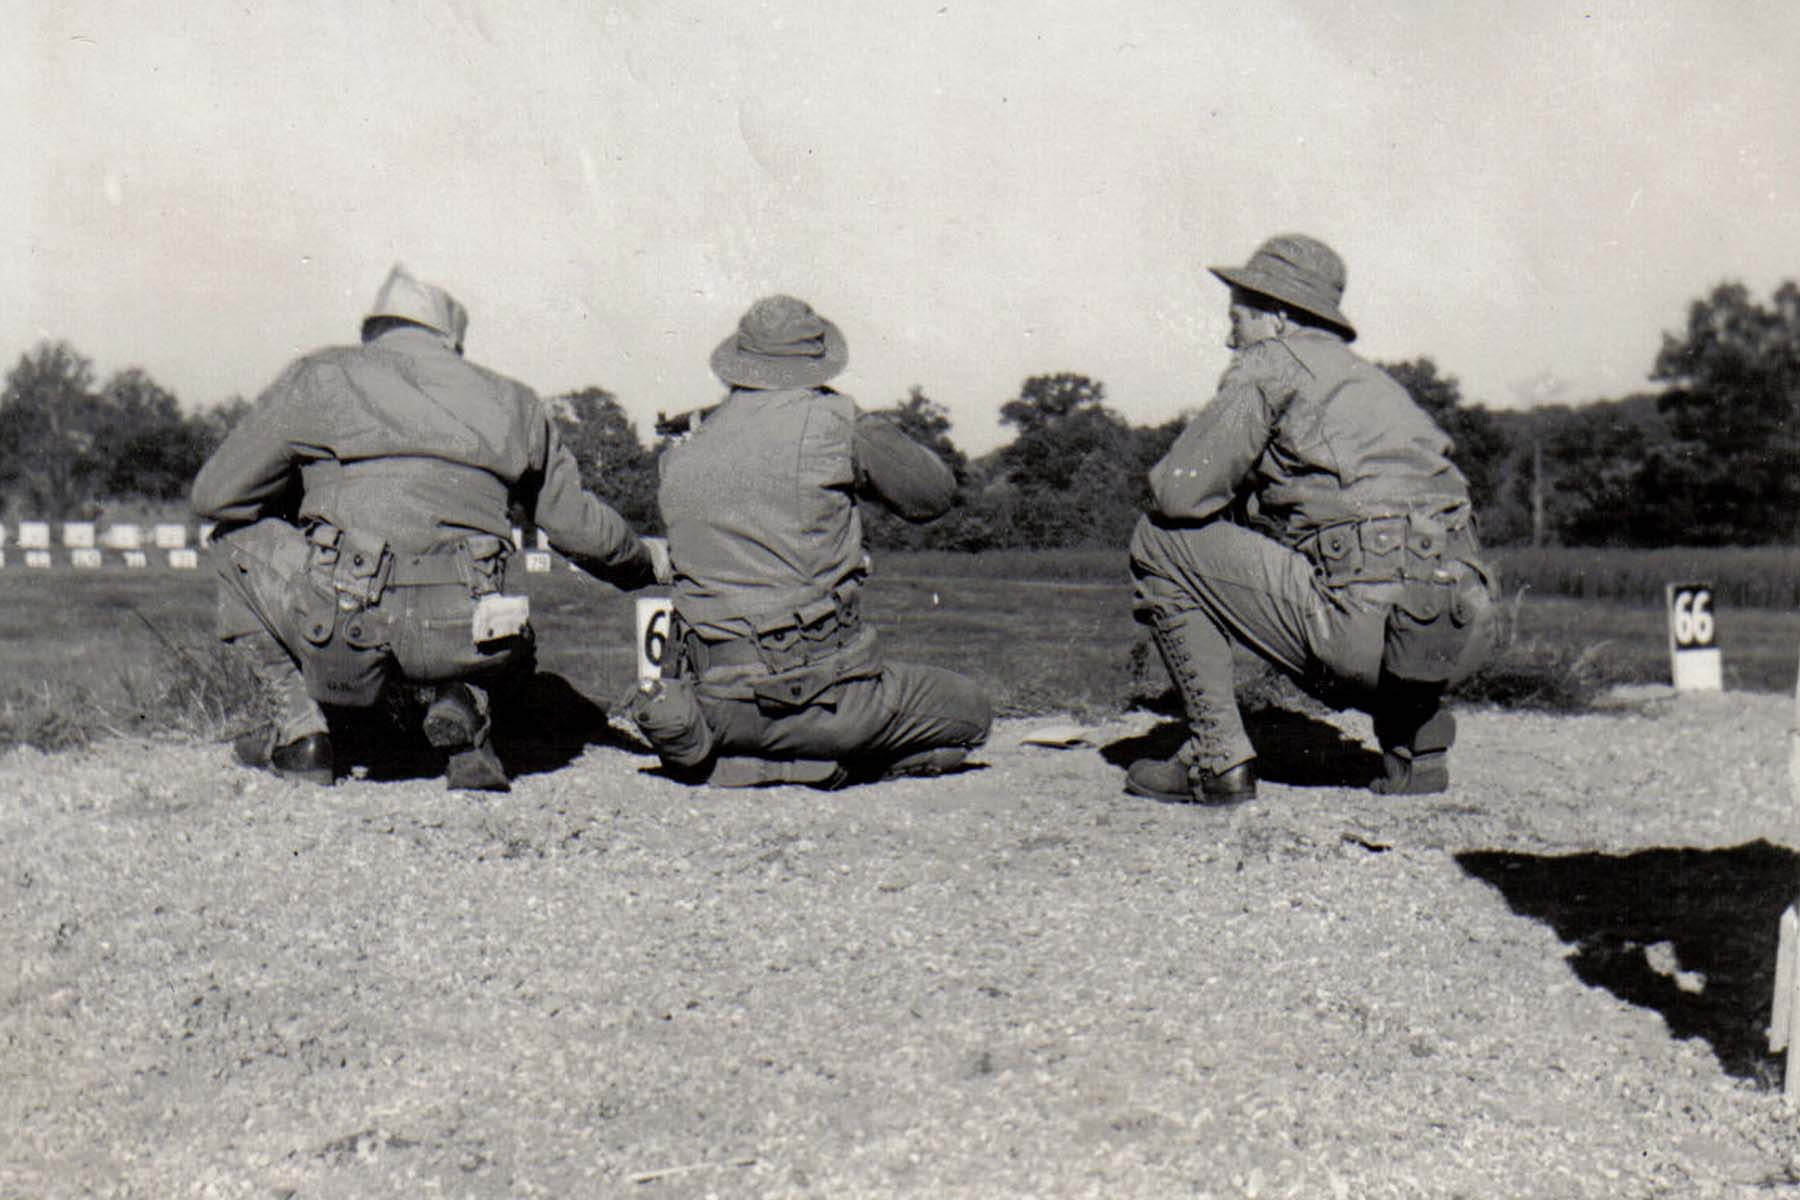 A30 Ft_ Leonard Wood_ MO - Tom Fallen firing from kneeling position with Lt_ Hayden coaching